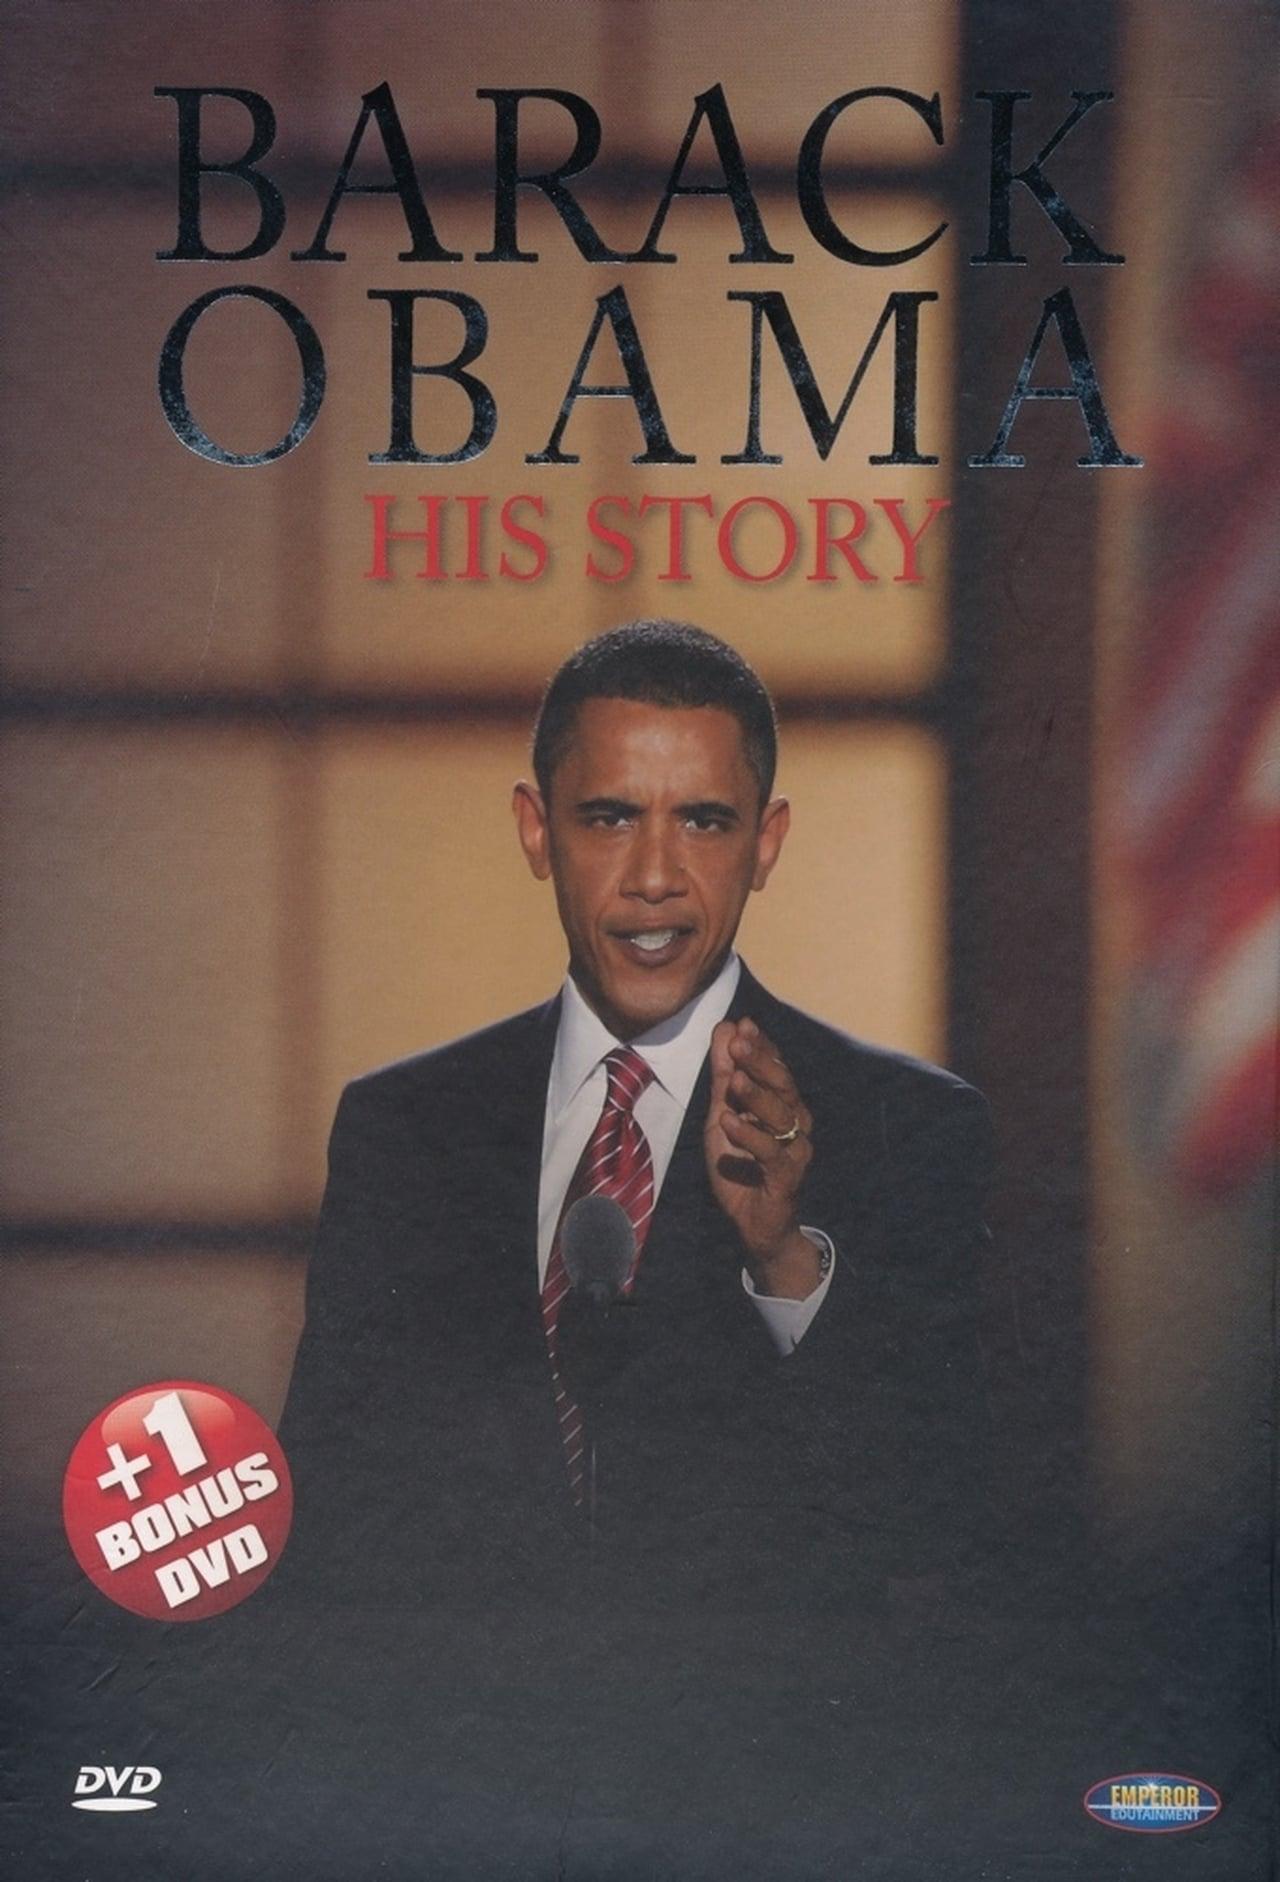 Barack Obama:  His Story